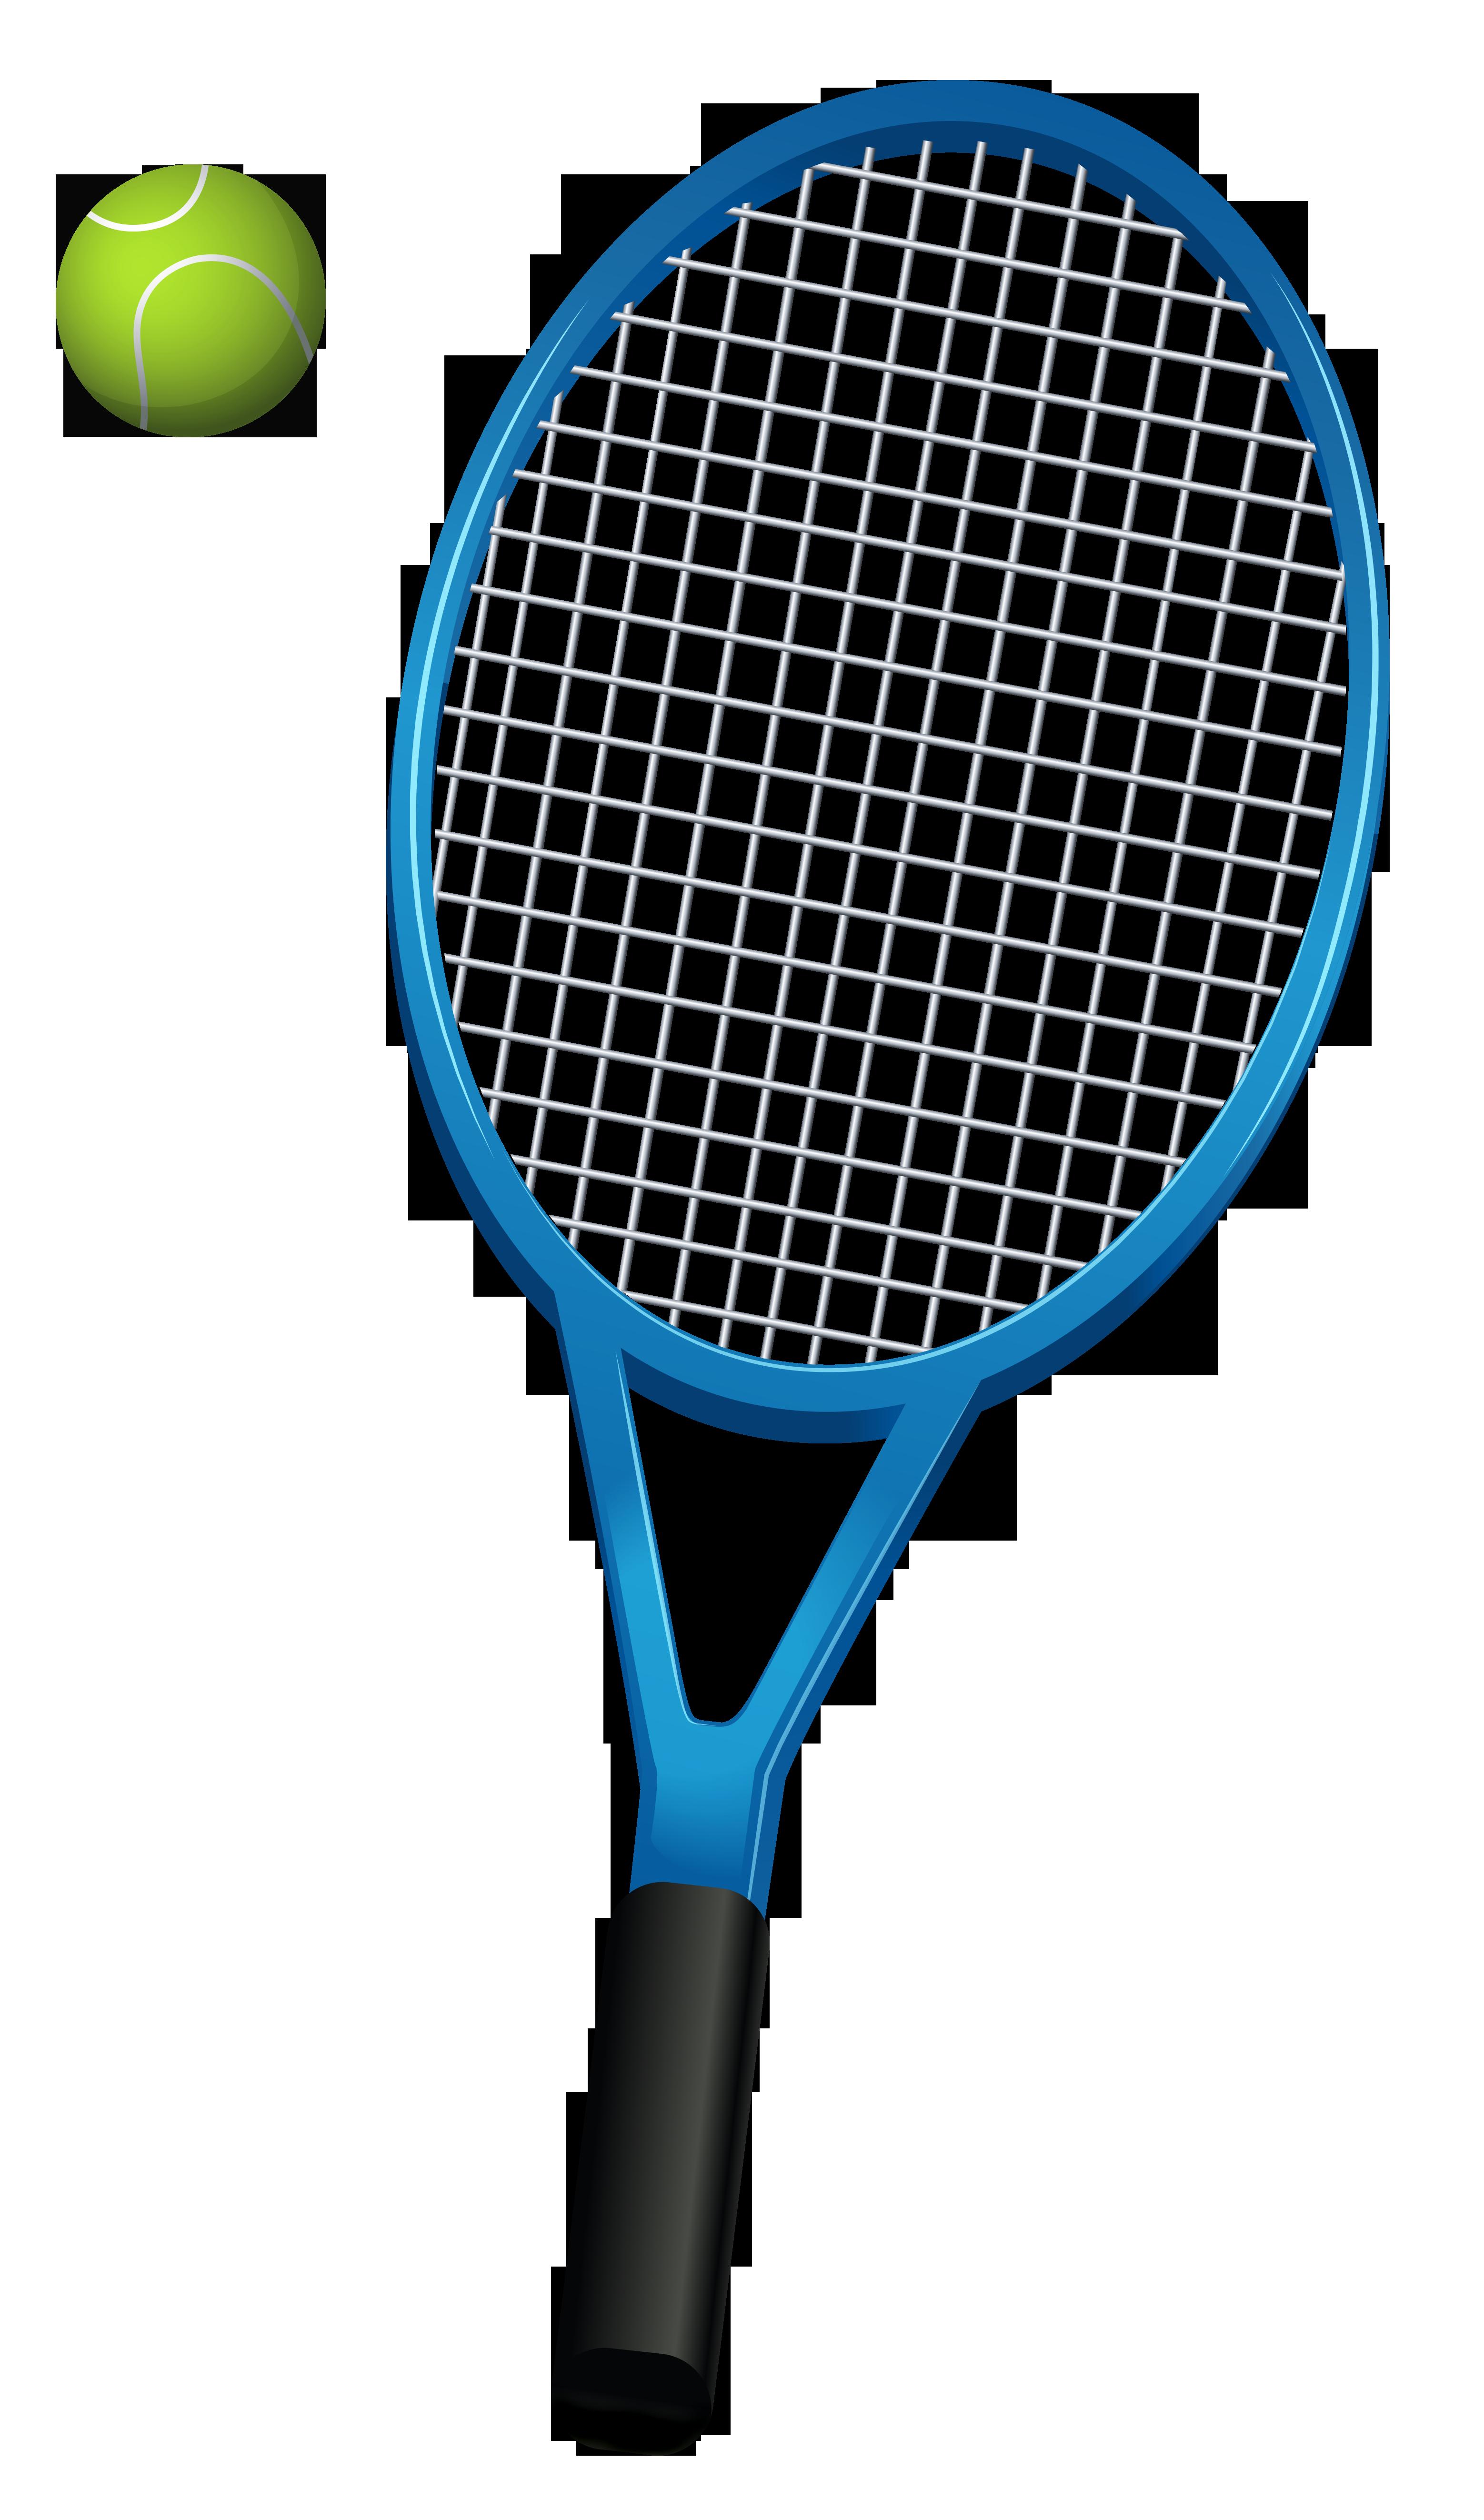 3116x5290 Tennis Ball Clipart Tennis Racket